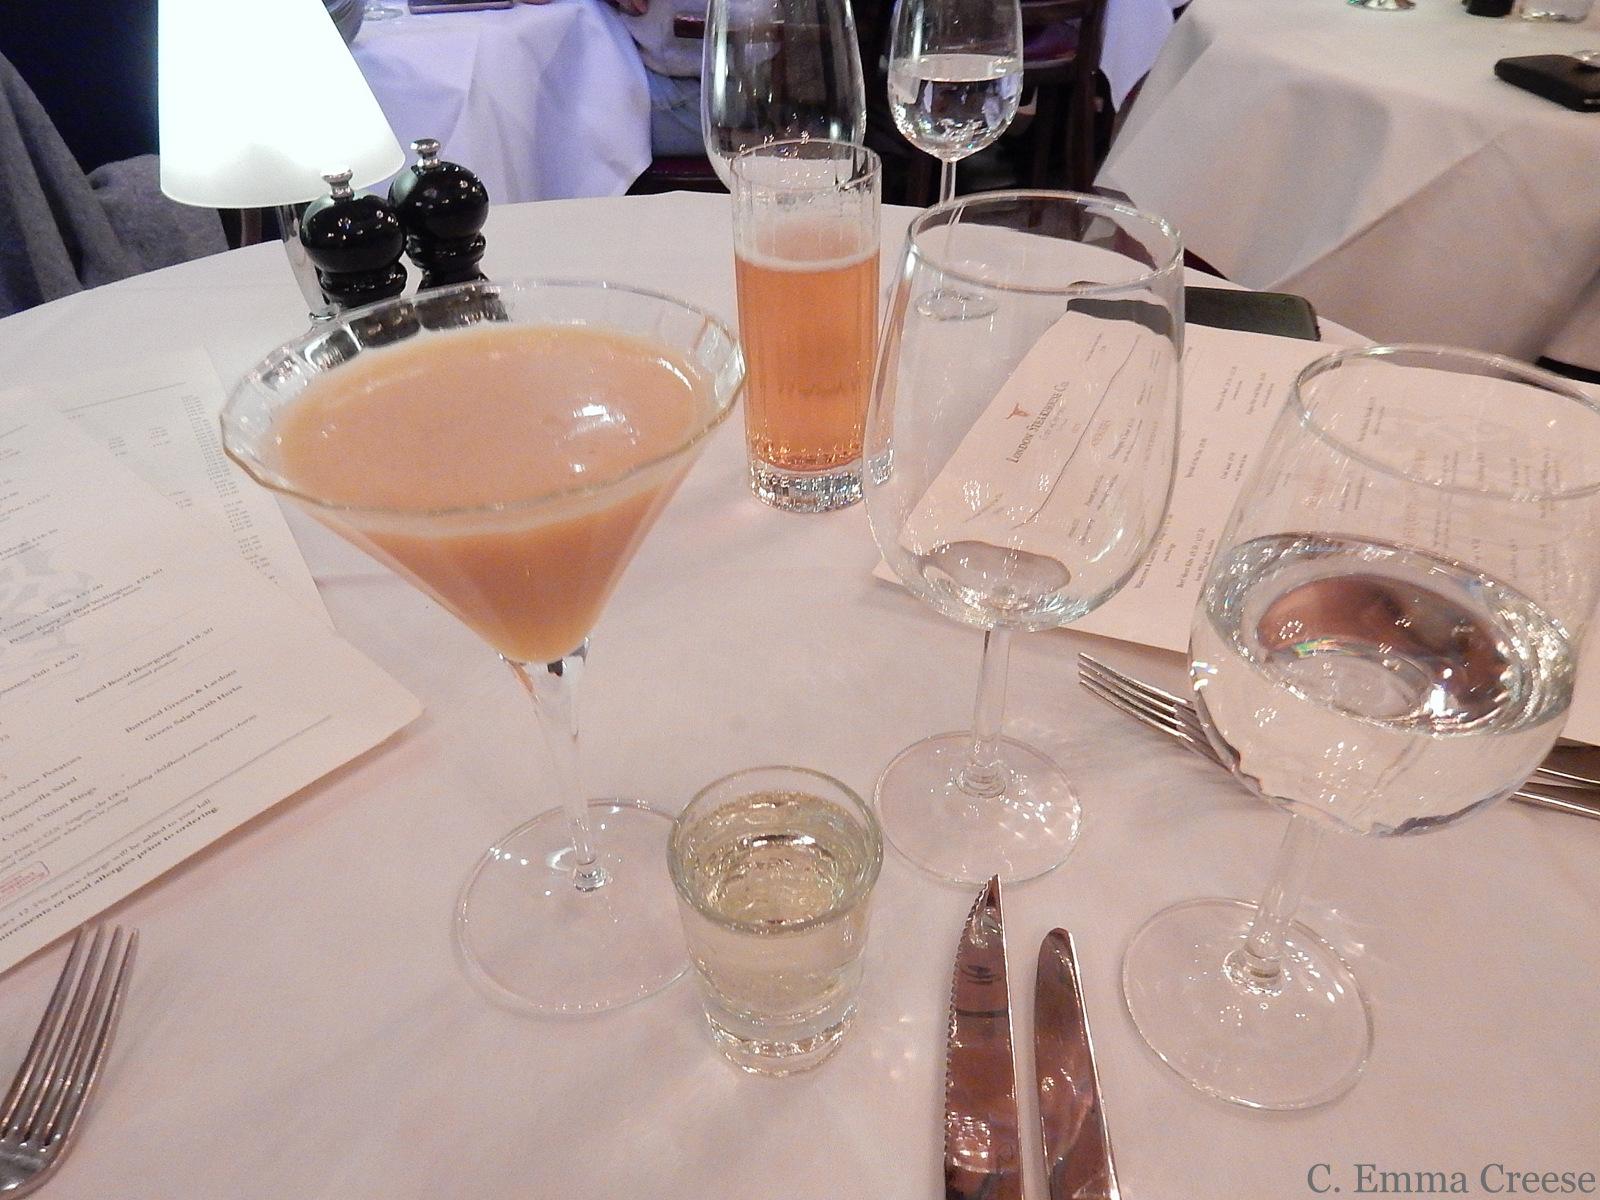 Marco Pierre White Steakhouse Co. City Restaurant Review Adventures of a London Kiwi